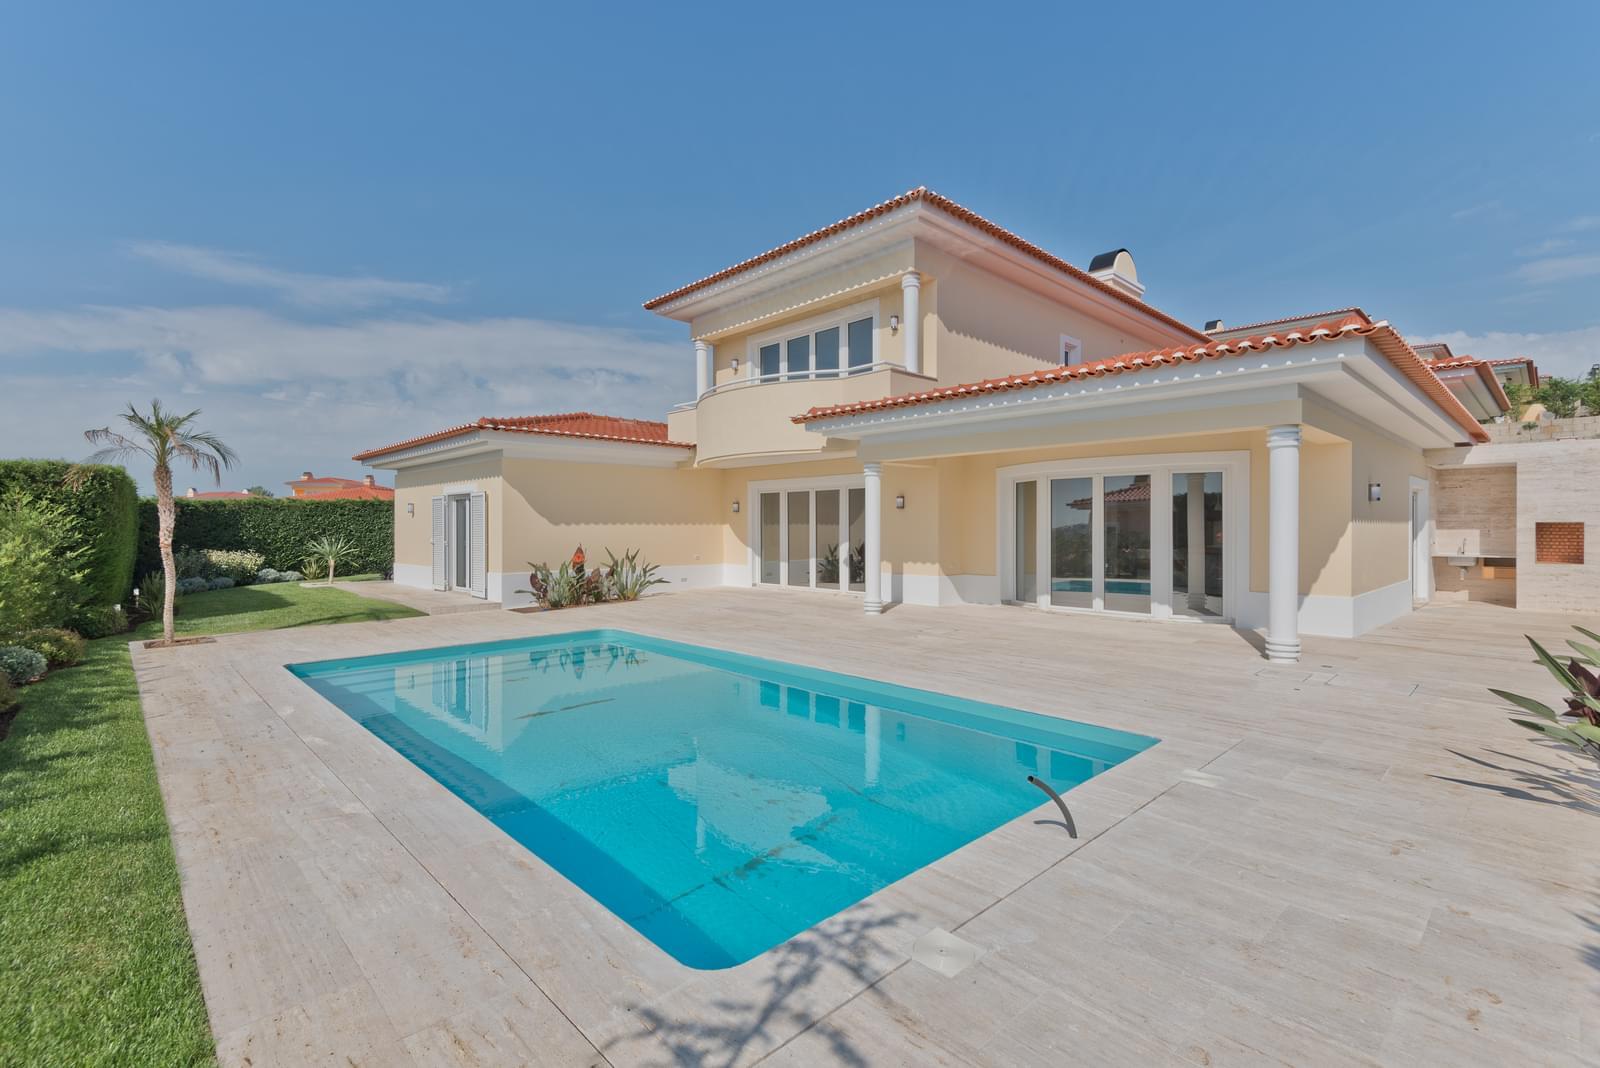 Moradia T4+1 com piscina